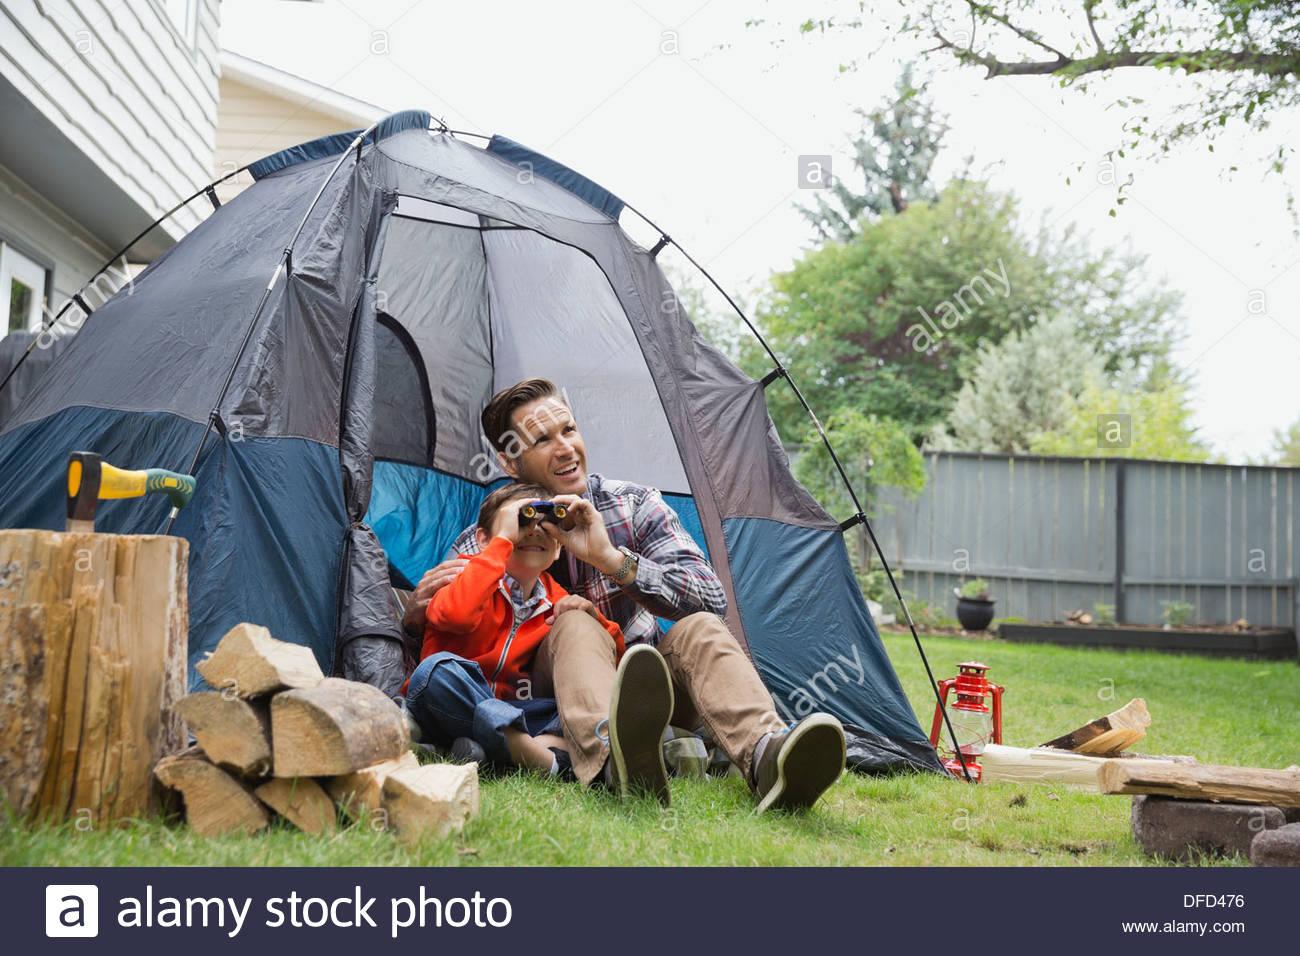 Boy looking through binoculars with father in backyard - Stock Image